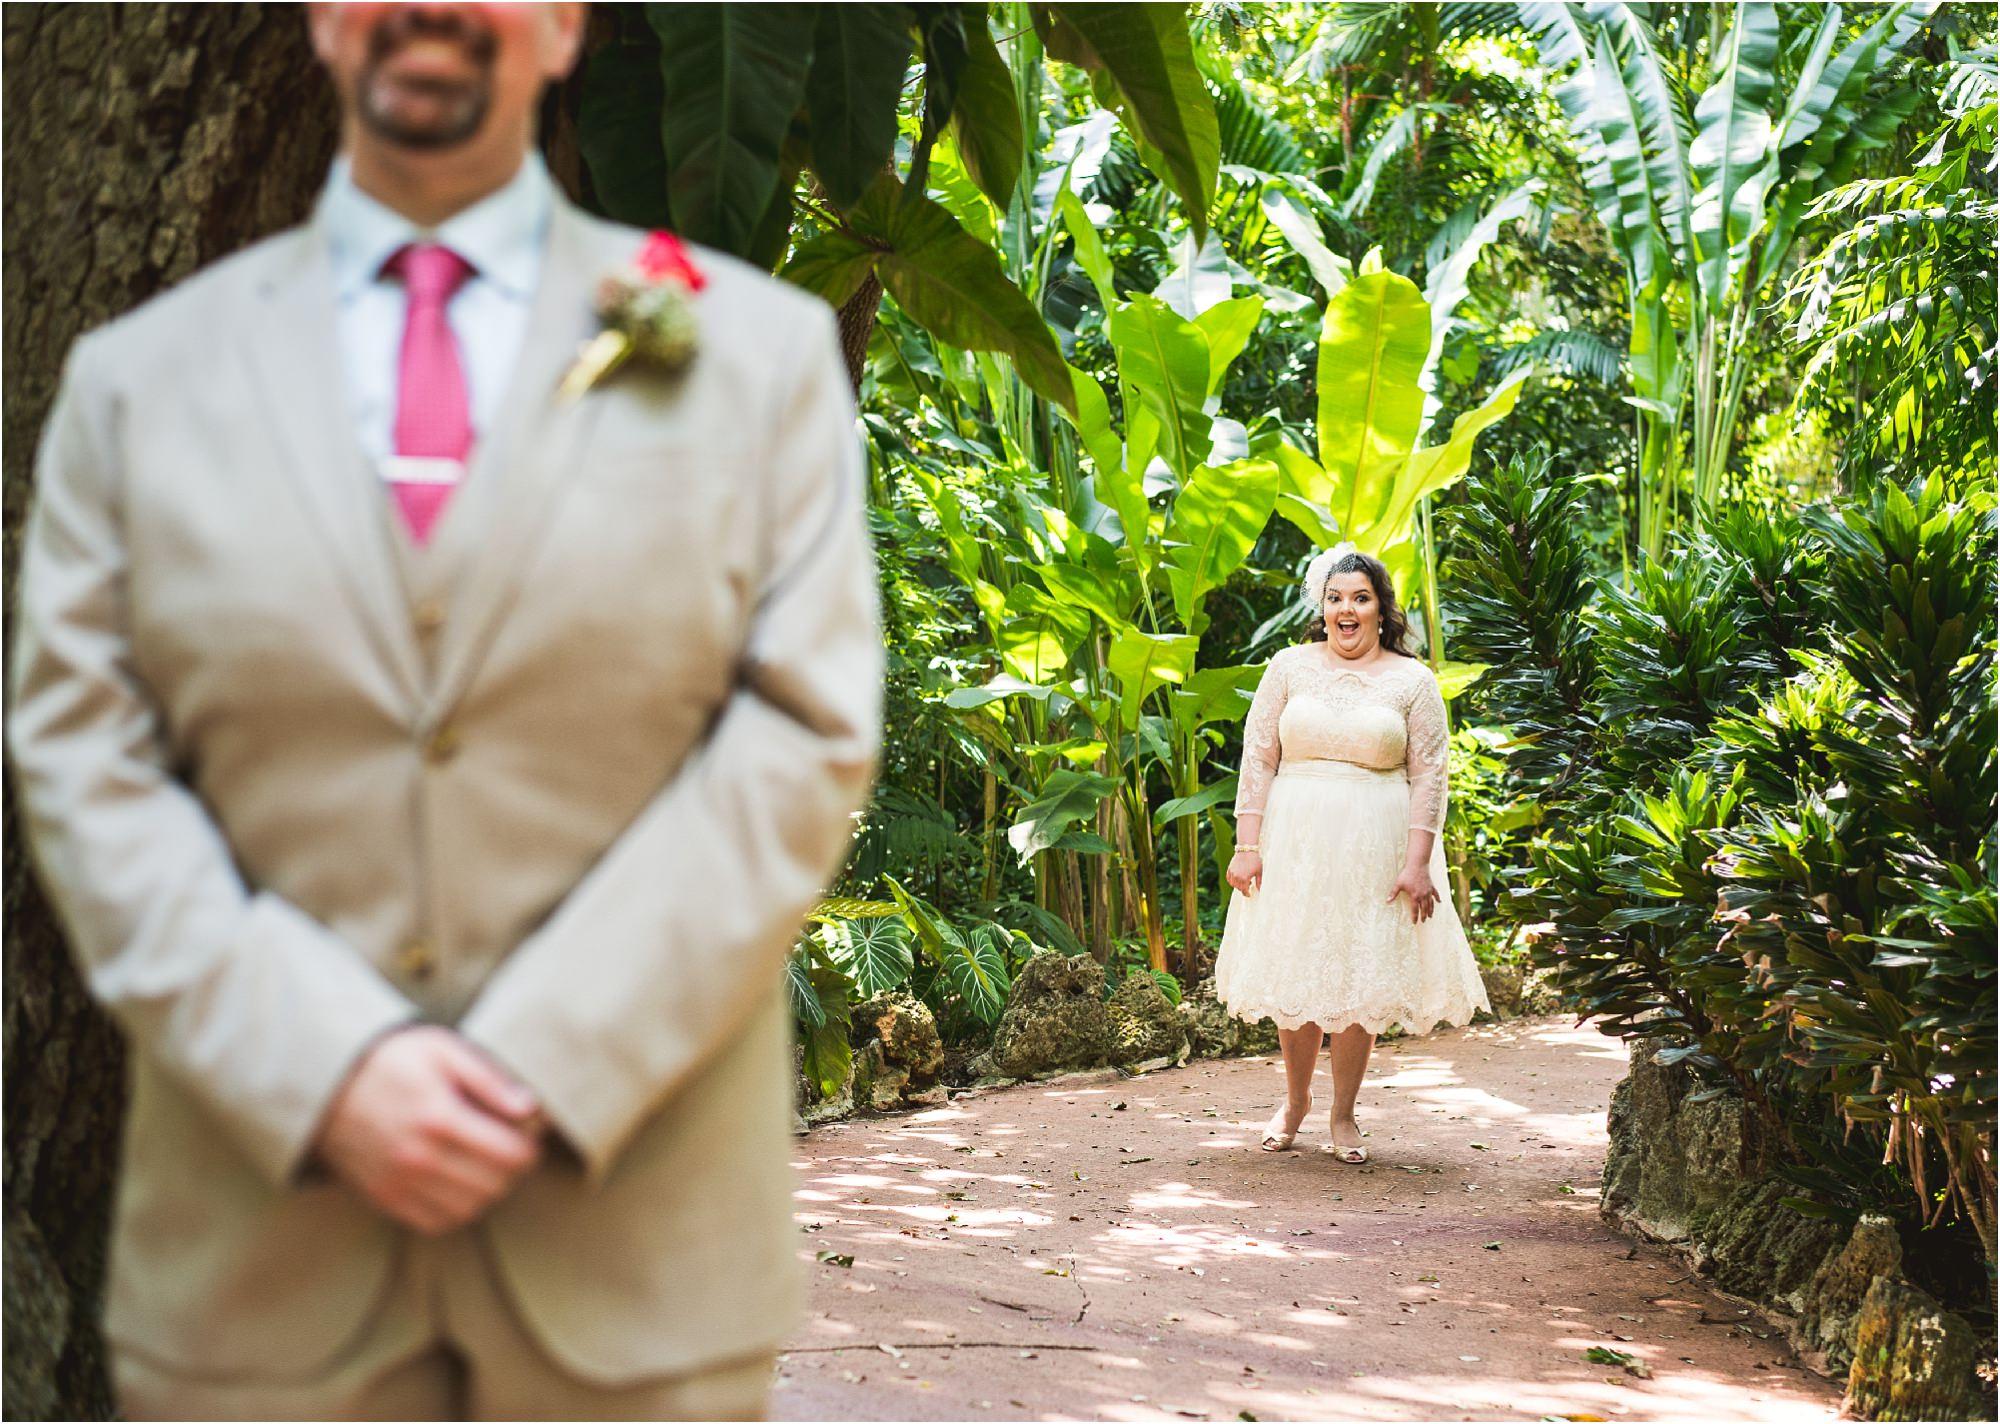 outdoor-rustic-pincrest-gardens-wedding-miami-photographer-jessenia-gonzalez_1008.jpg